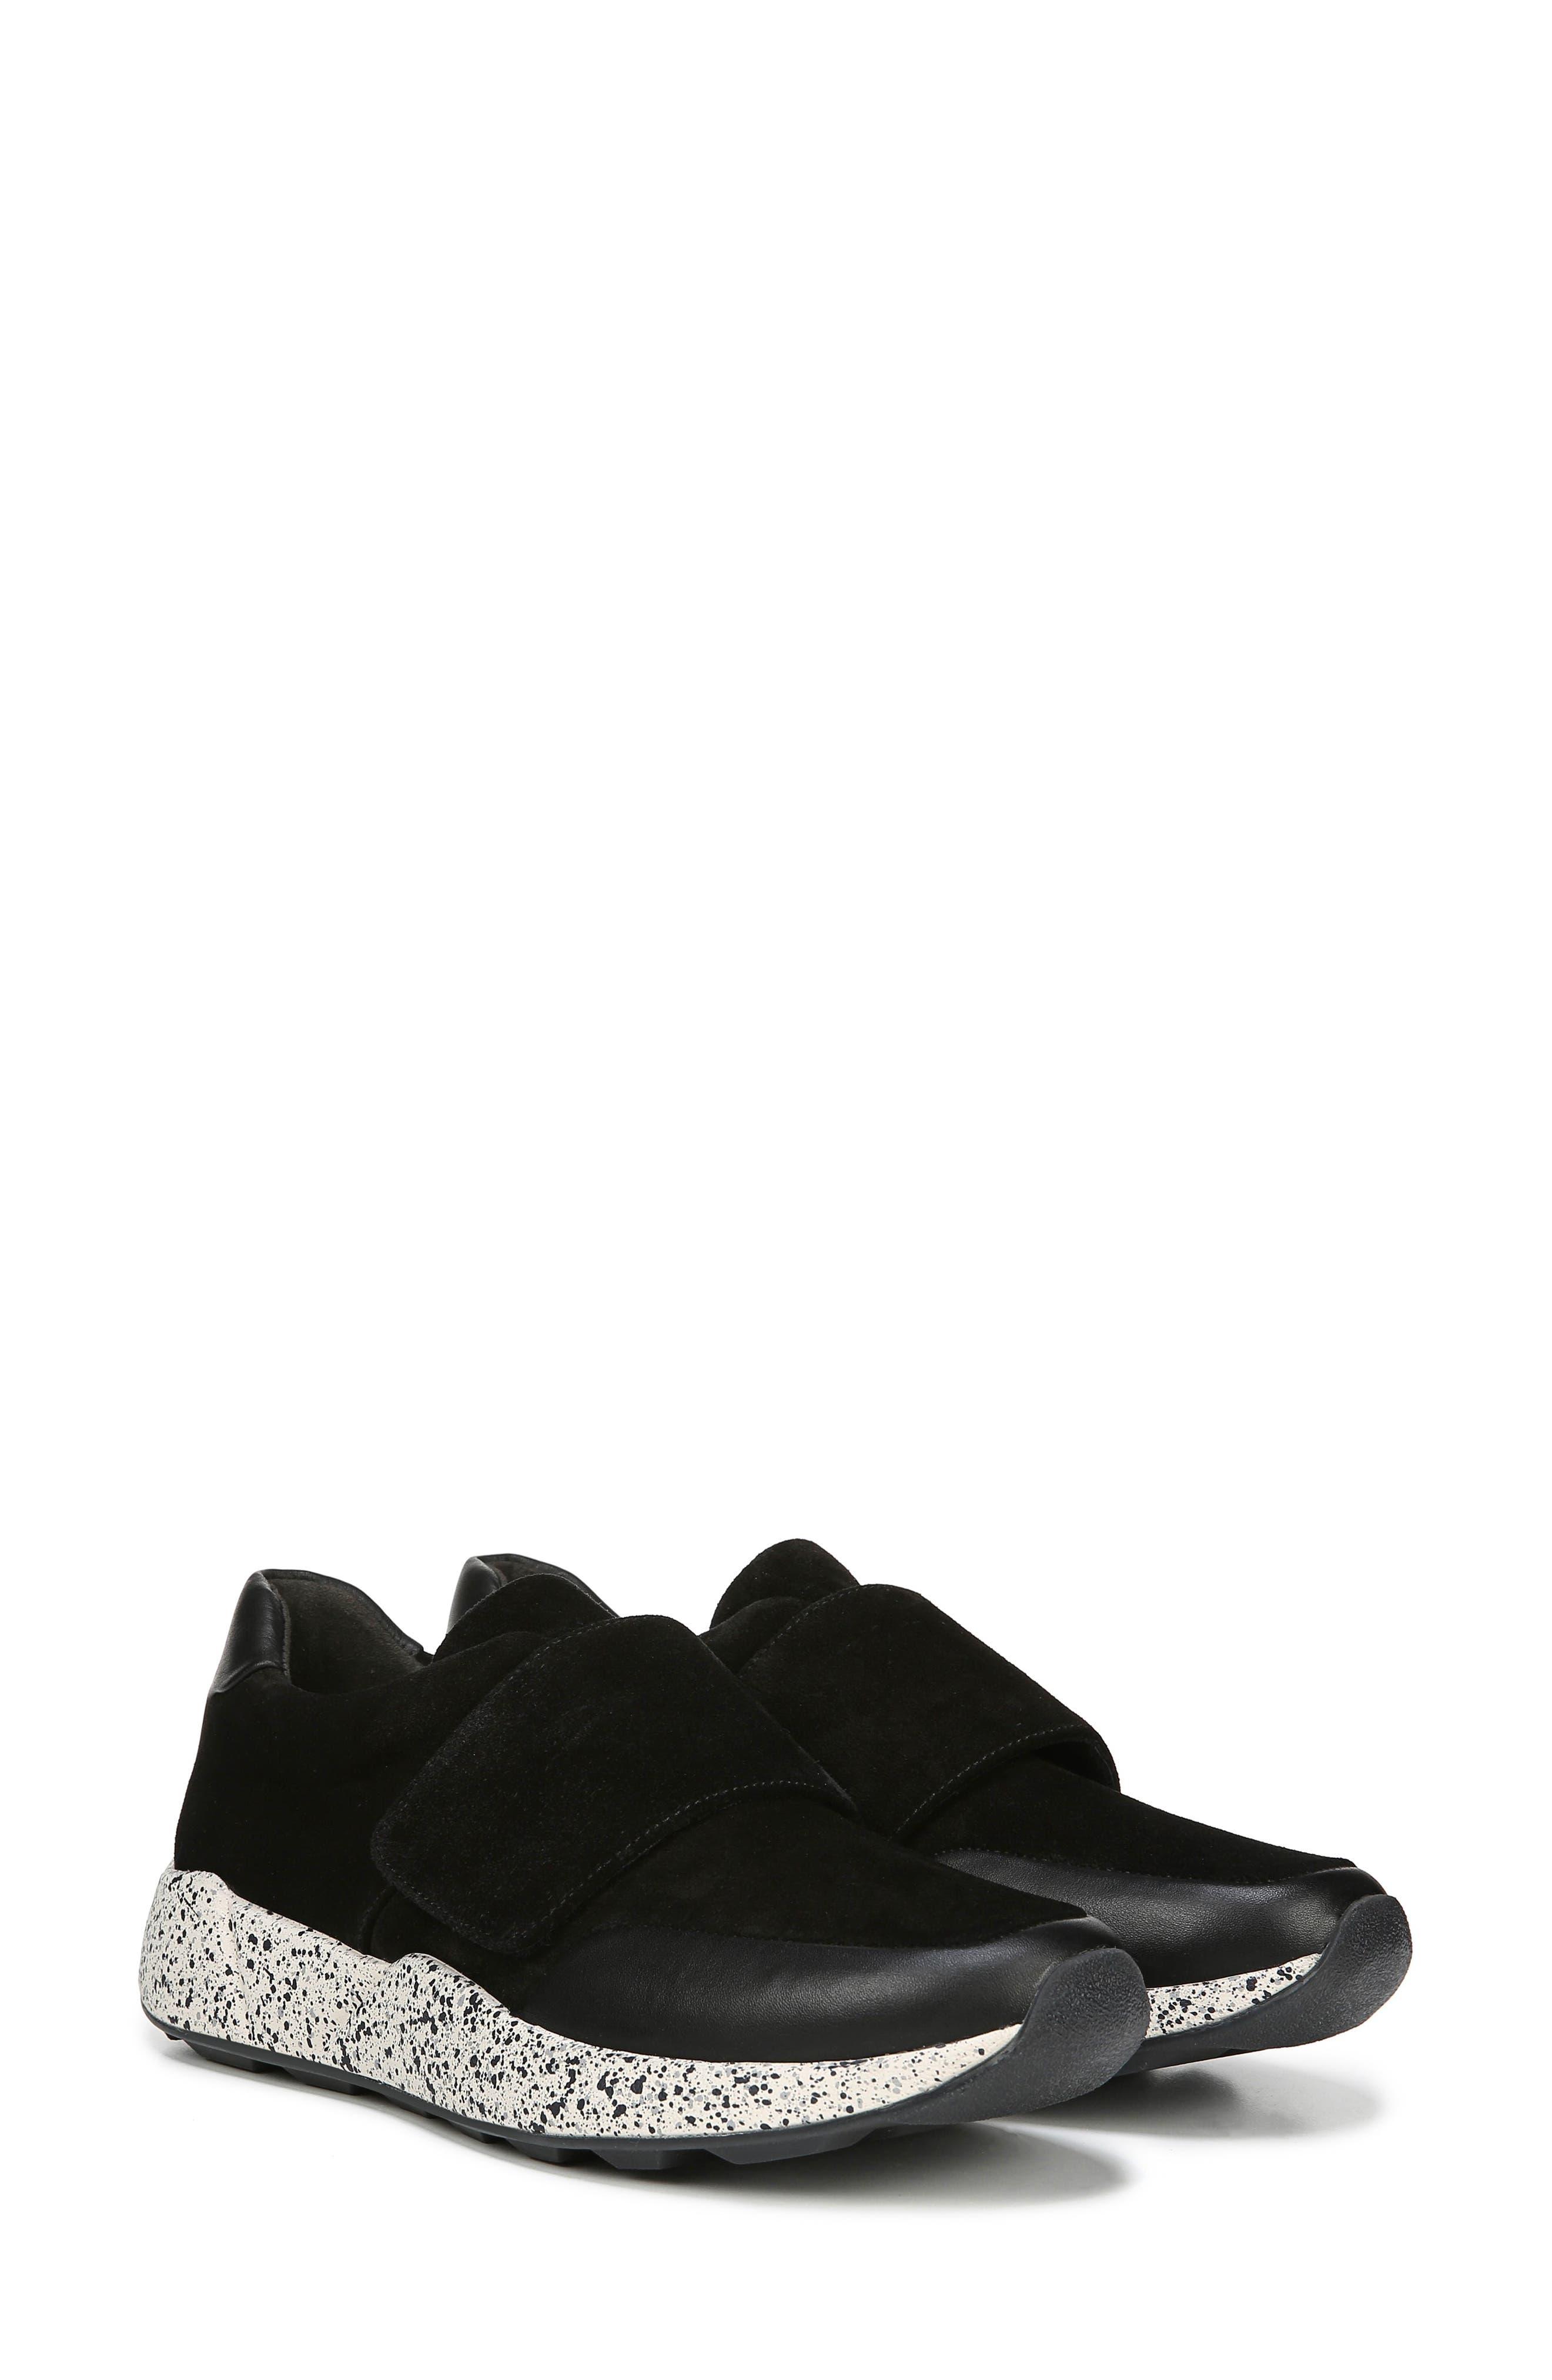 Gage Sneaker,                             Alternate thumbnail 9, color,                             BLACK COCO